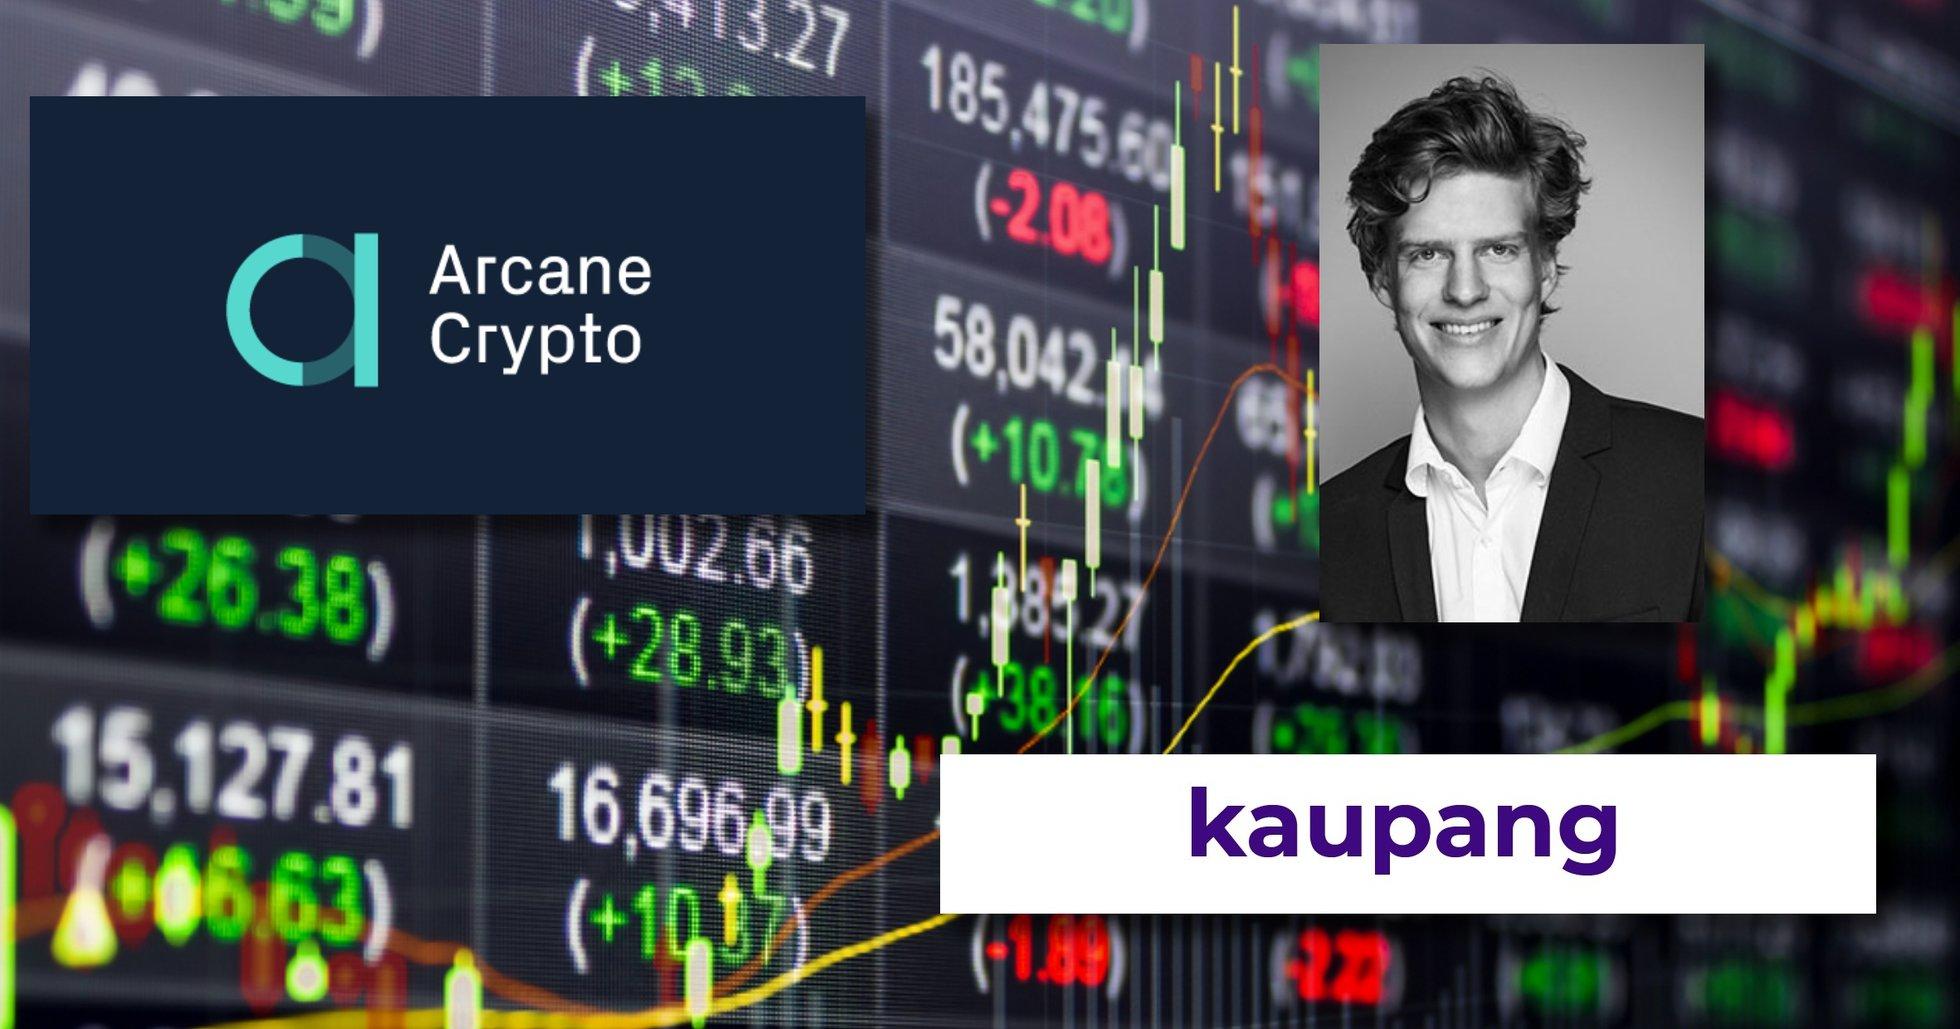 Arcane Crypto köper den norska kryptoväxlaren Kaupang